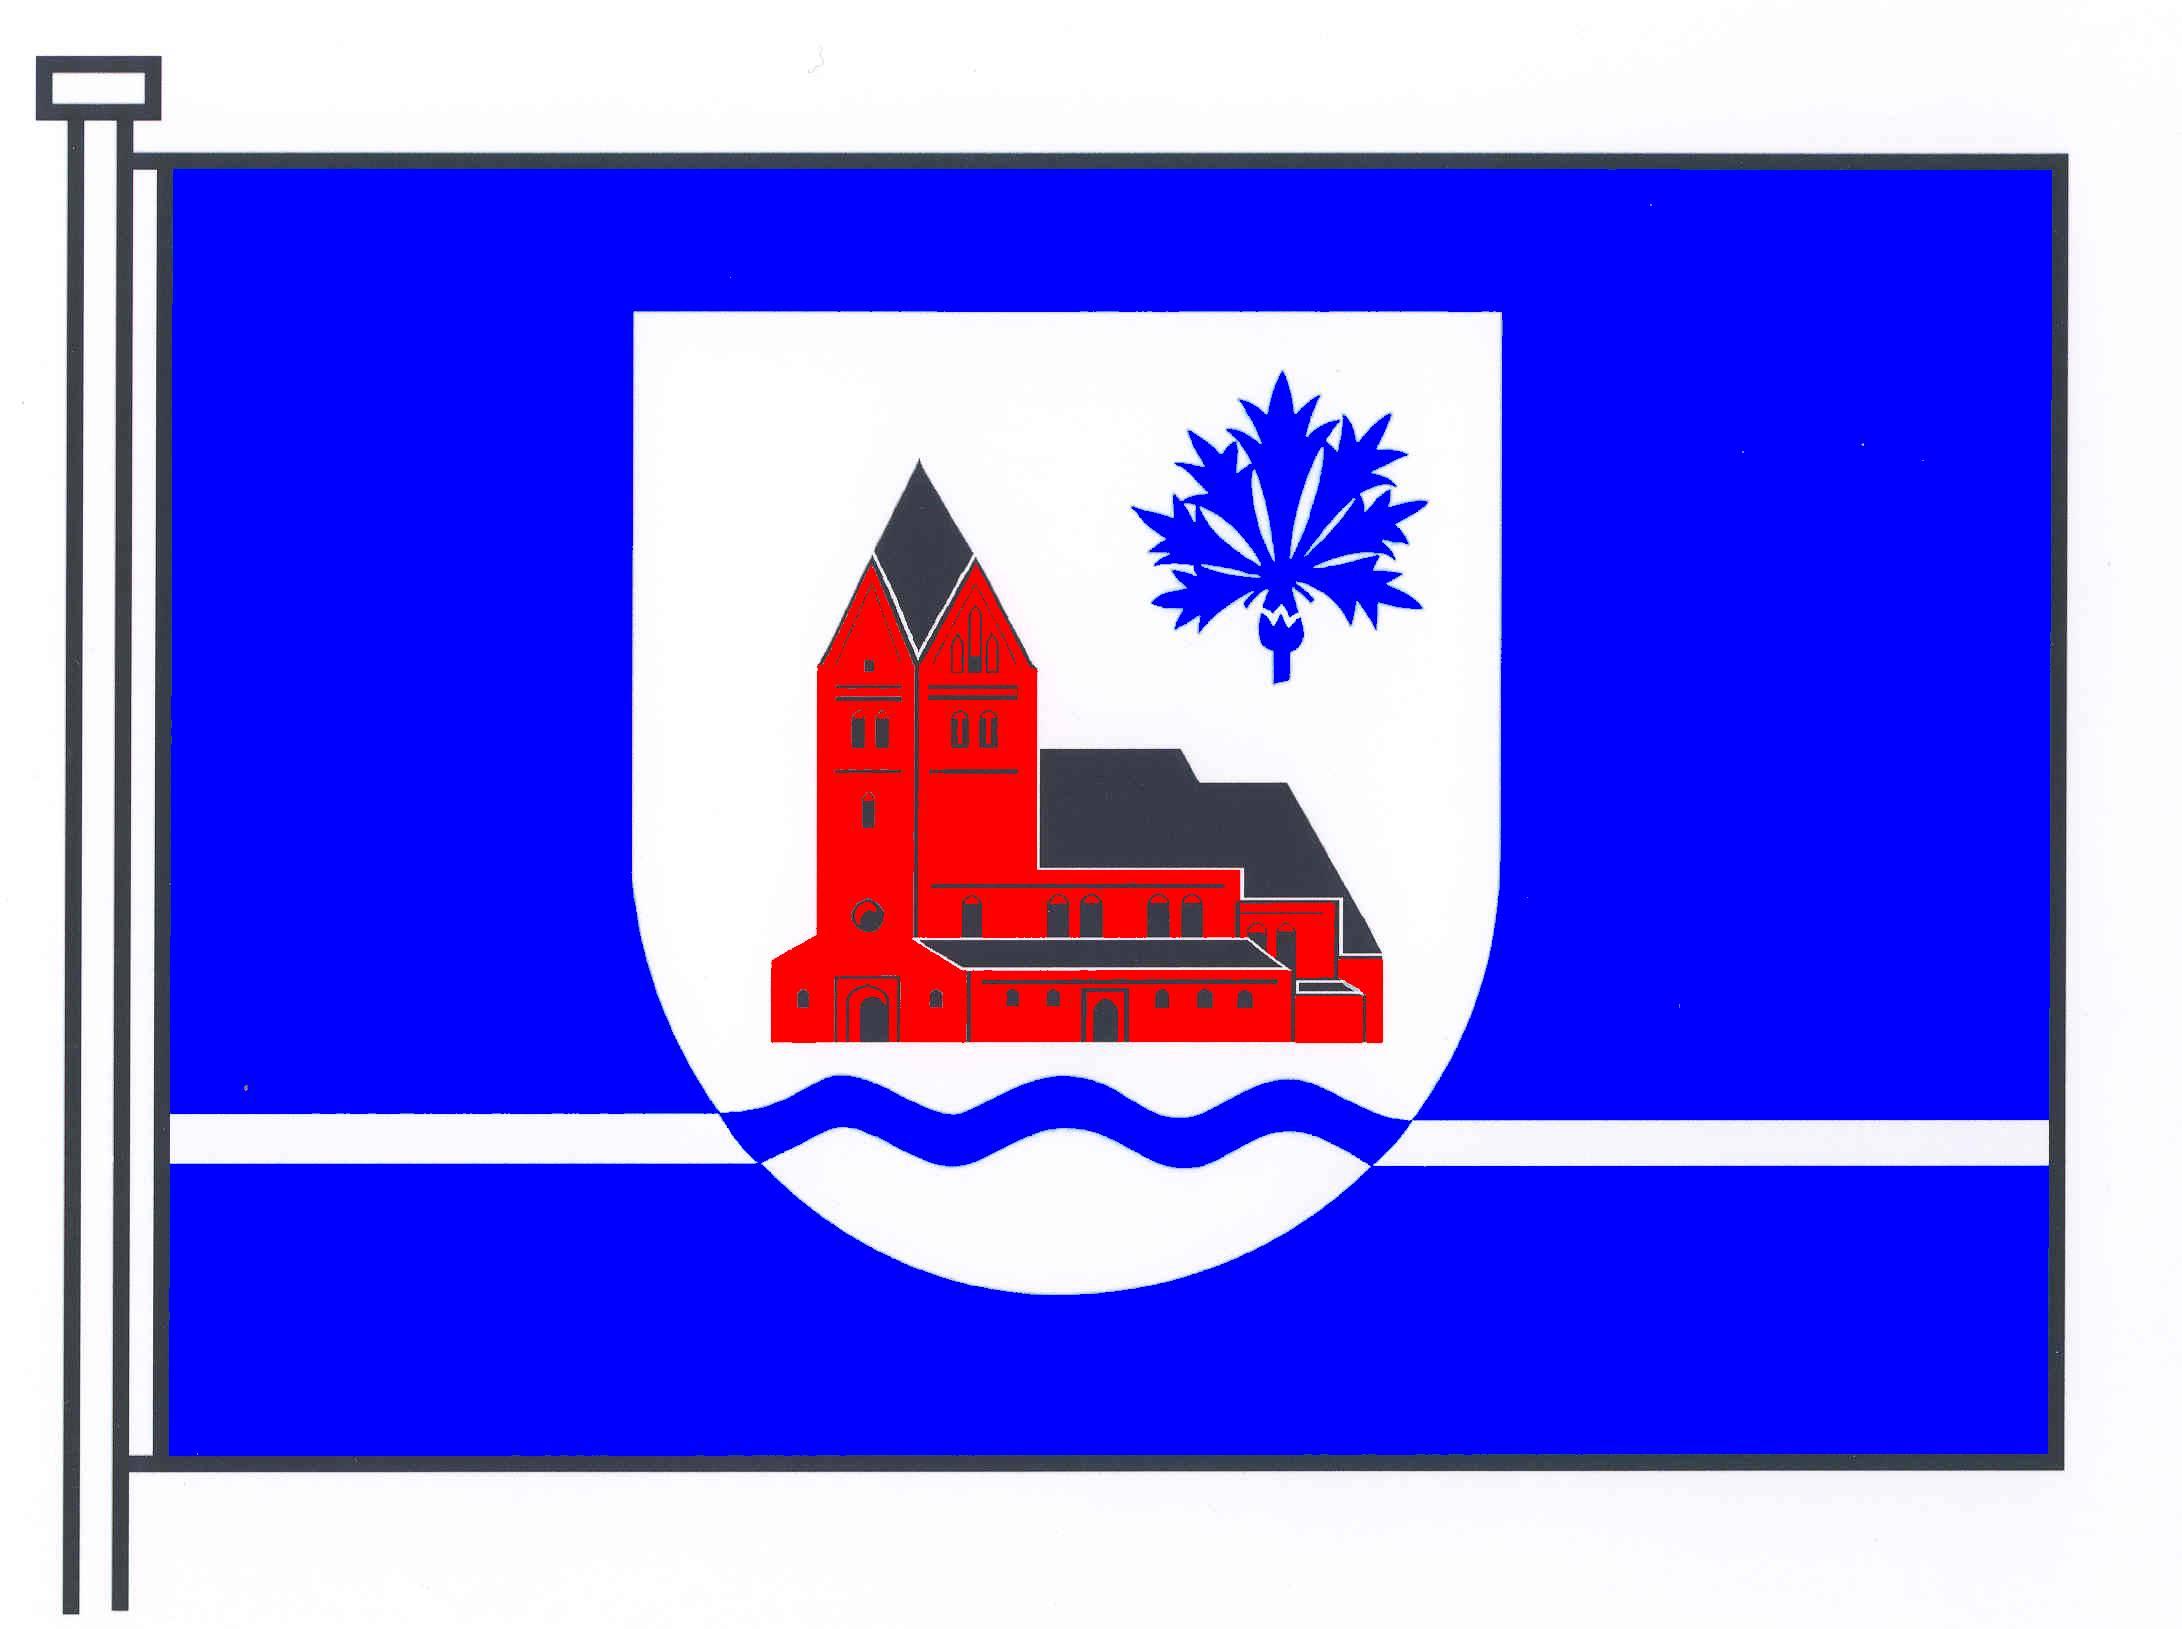 Flagge GemeindeAltenkrempe, Kreis Ostholstein